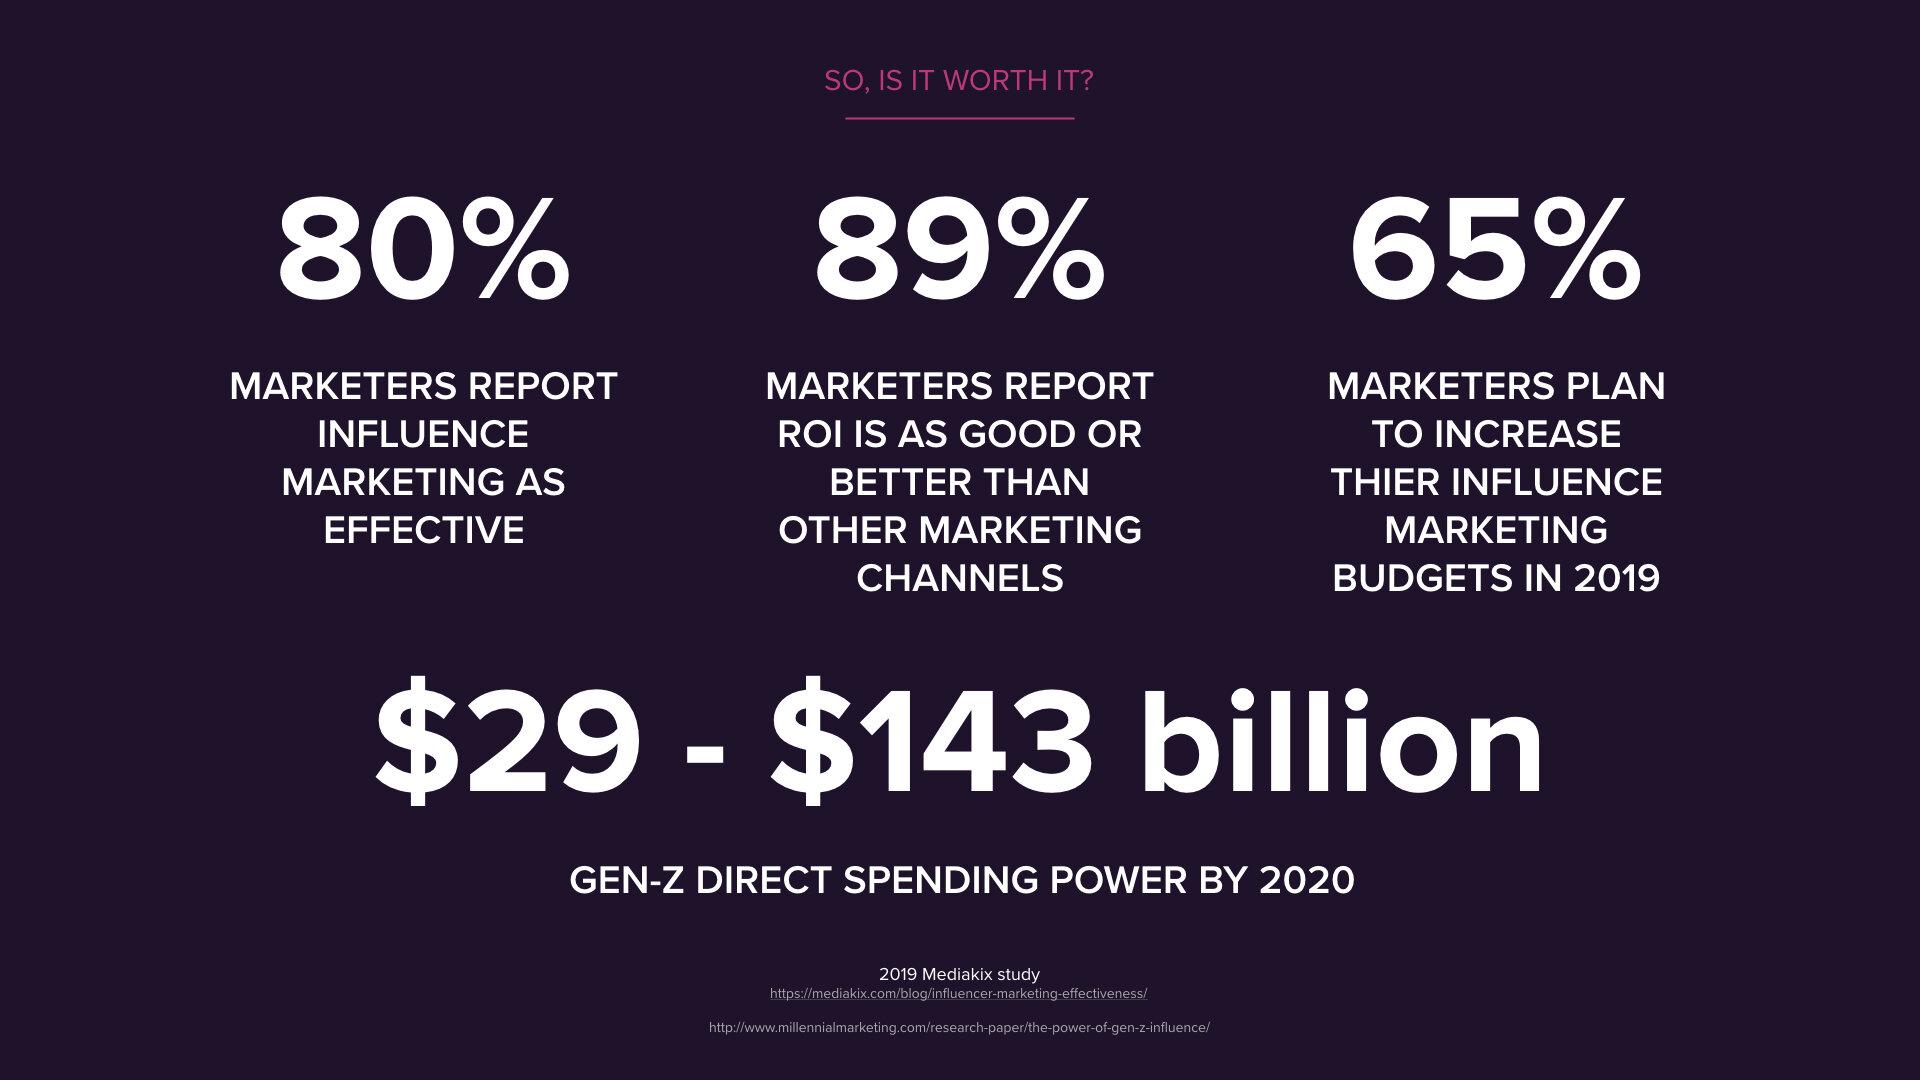 Influencer Marketing: Is it worth it? 2019 Stats.